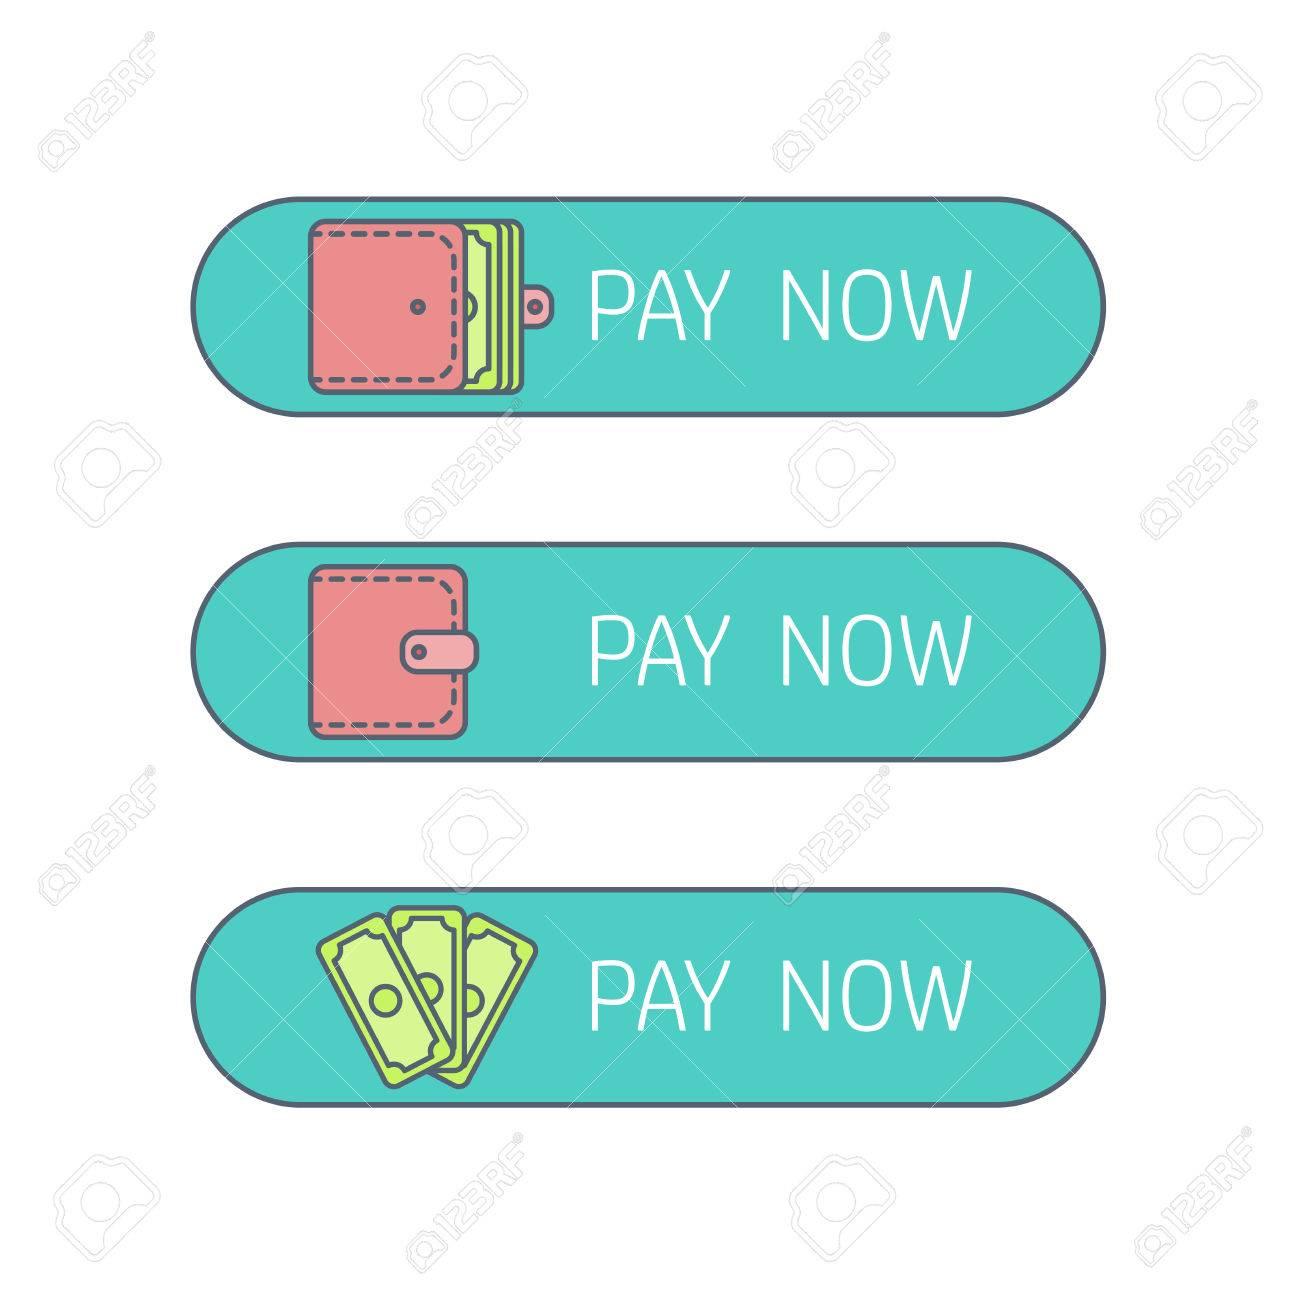 Receipt Of Money free printable wedding shower invitations – Receipt of Money